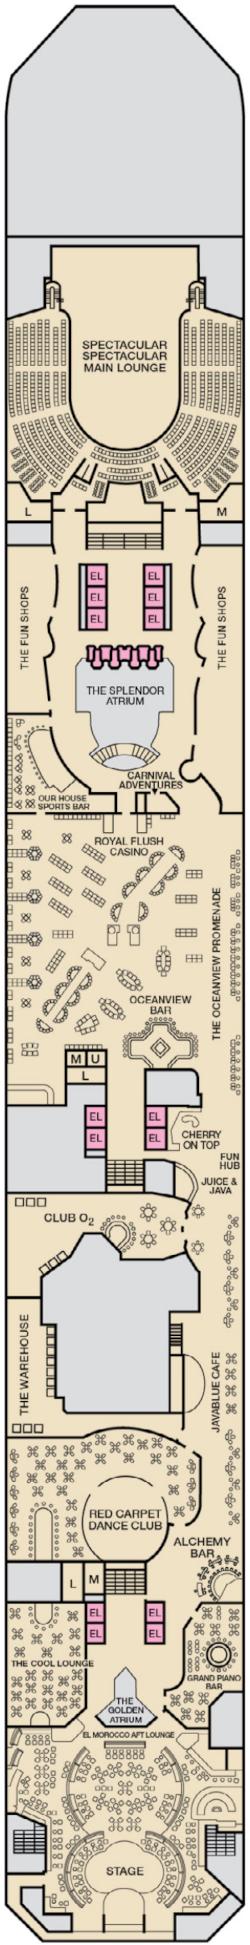 Carnival Splendor Promenade Deck Deck Plan